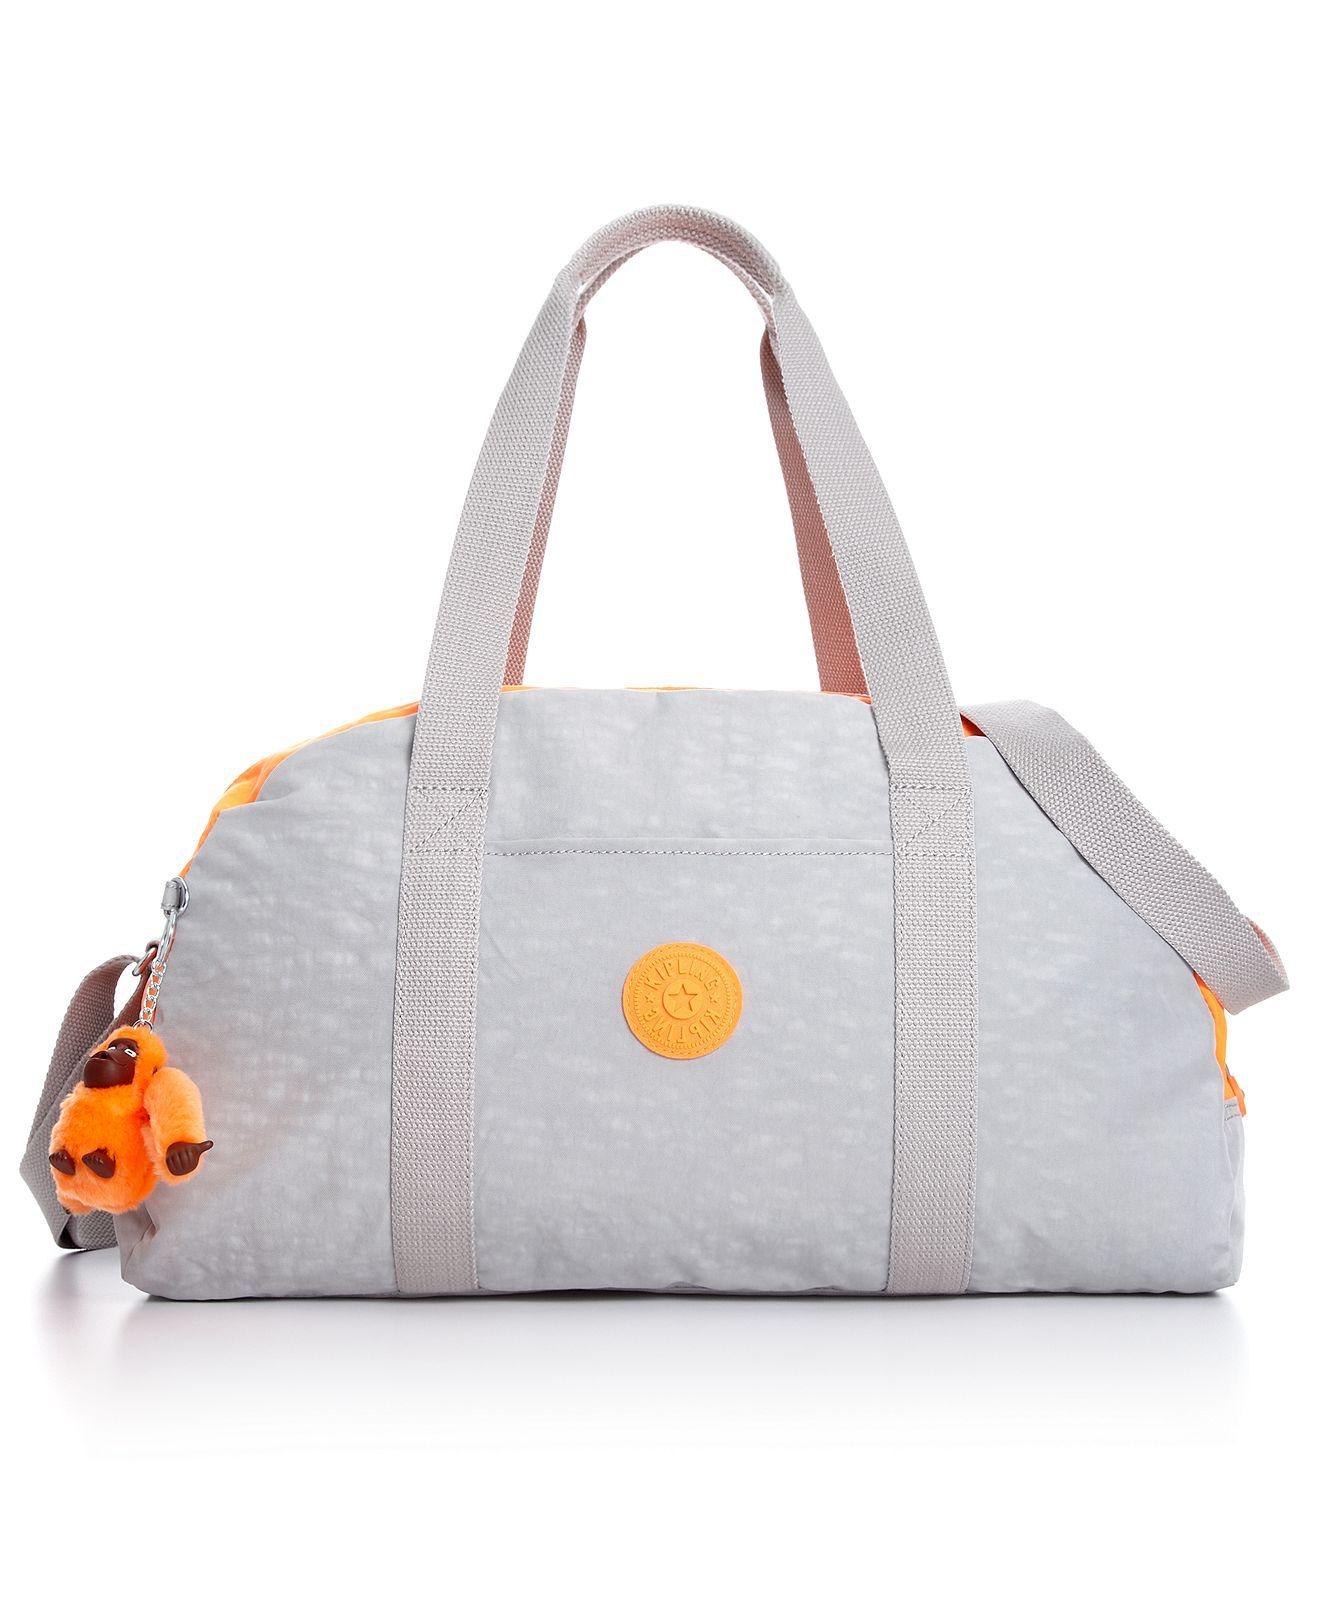 Kipling Handbags, New Yuzu Duffle Bag